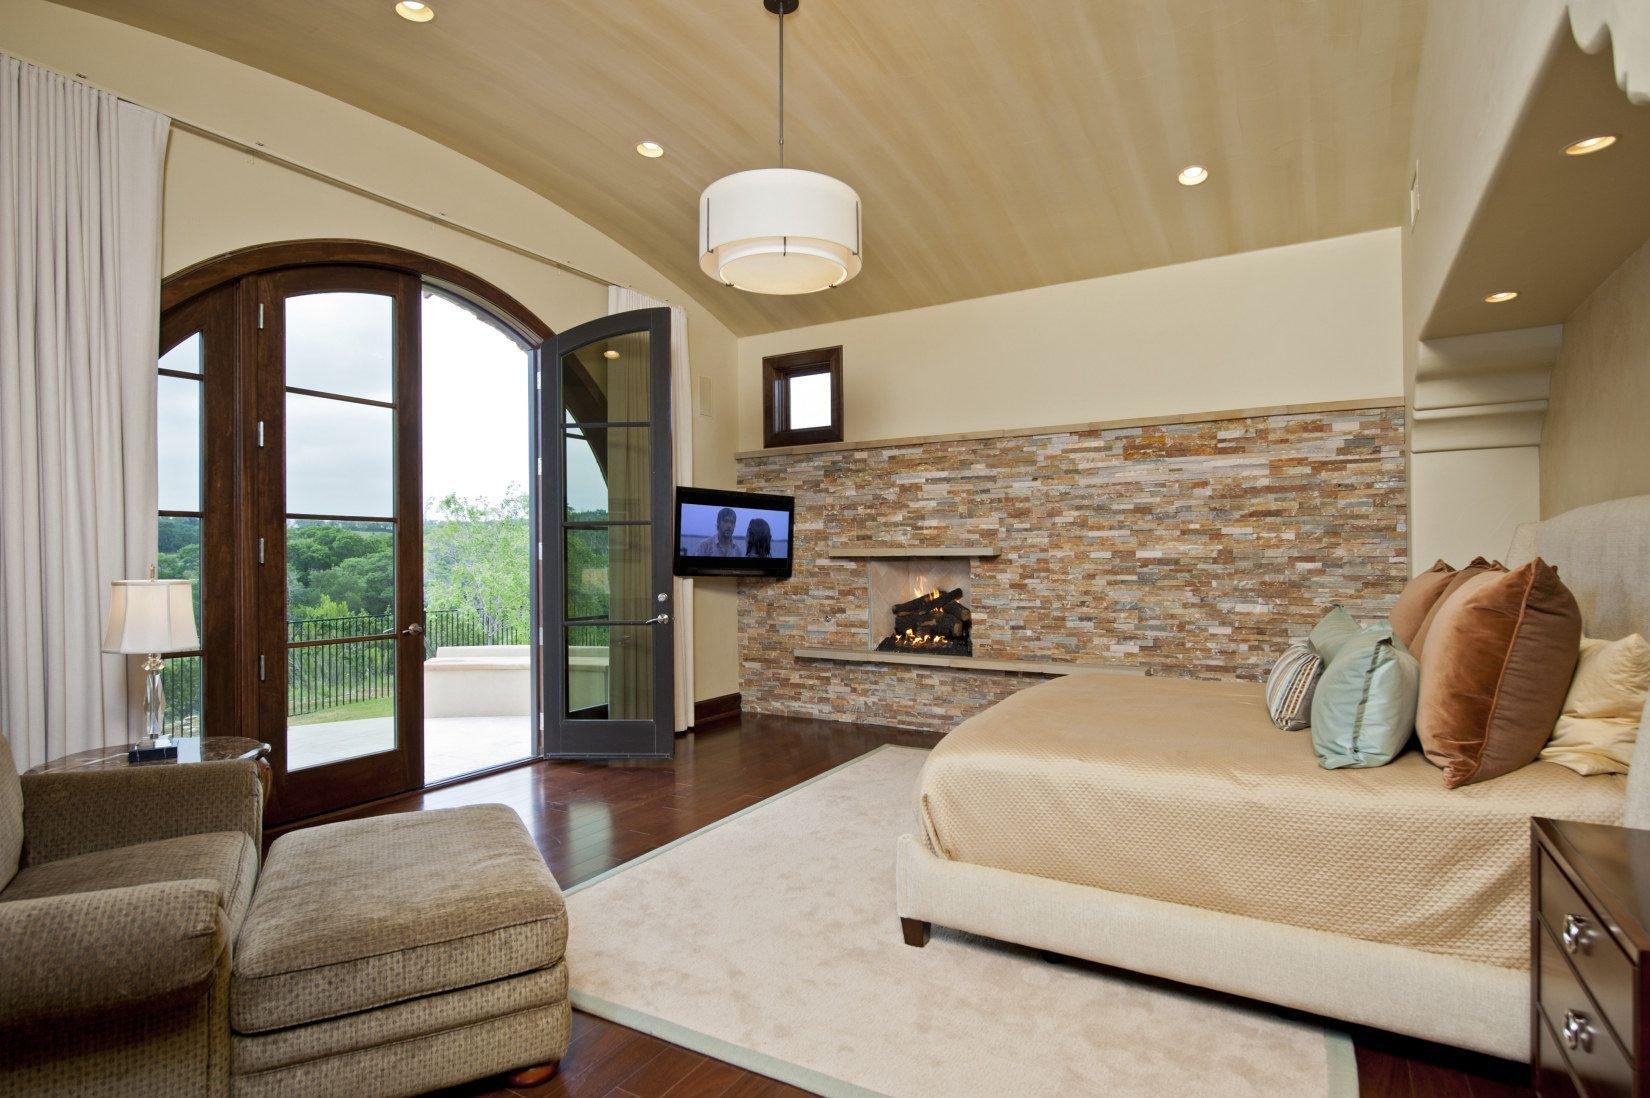 Master Bedroom with Fireplace Luxury 16 Spectacular Master Bedroom Hardwood Floor